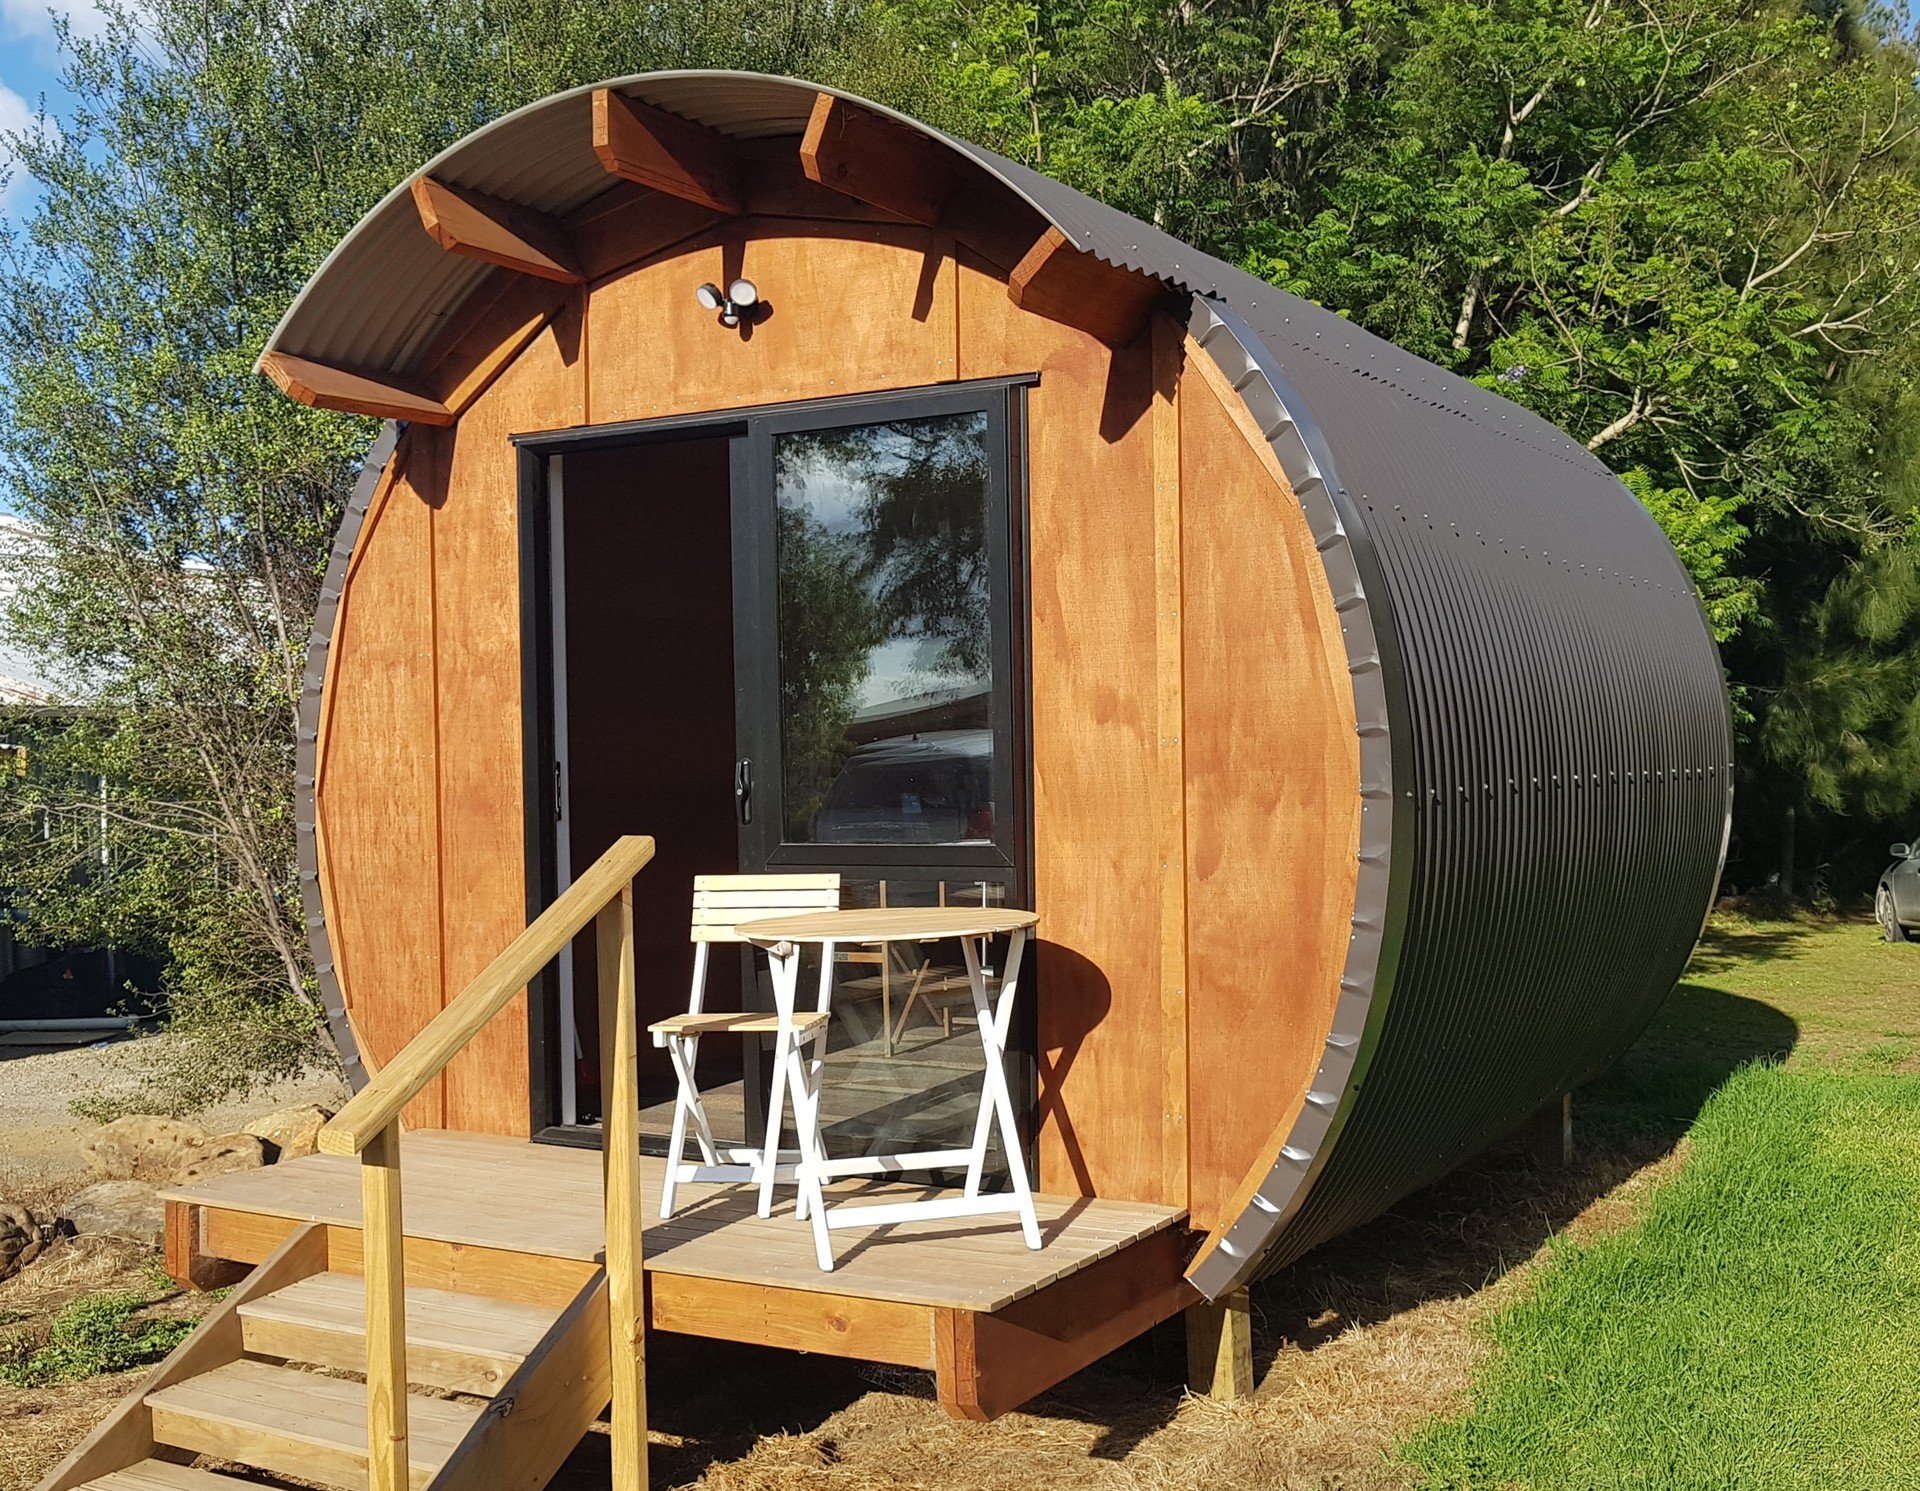 Consent-free cabin challenge spawns new Northland business